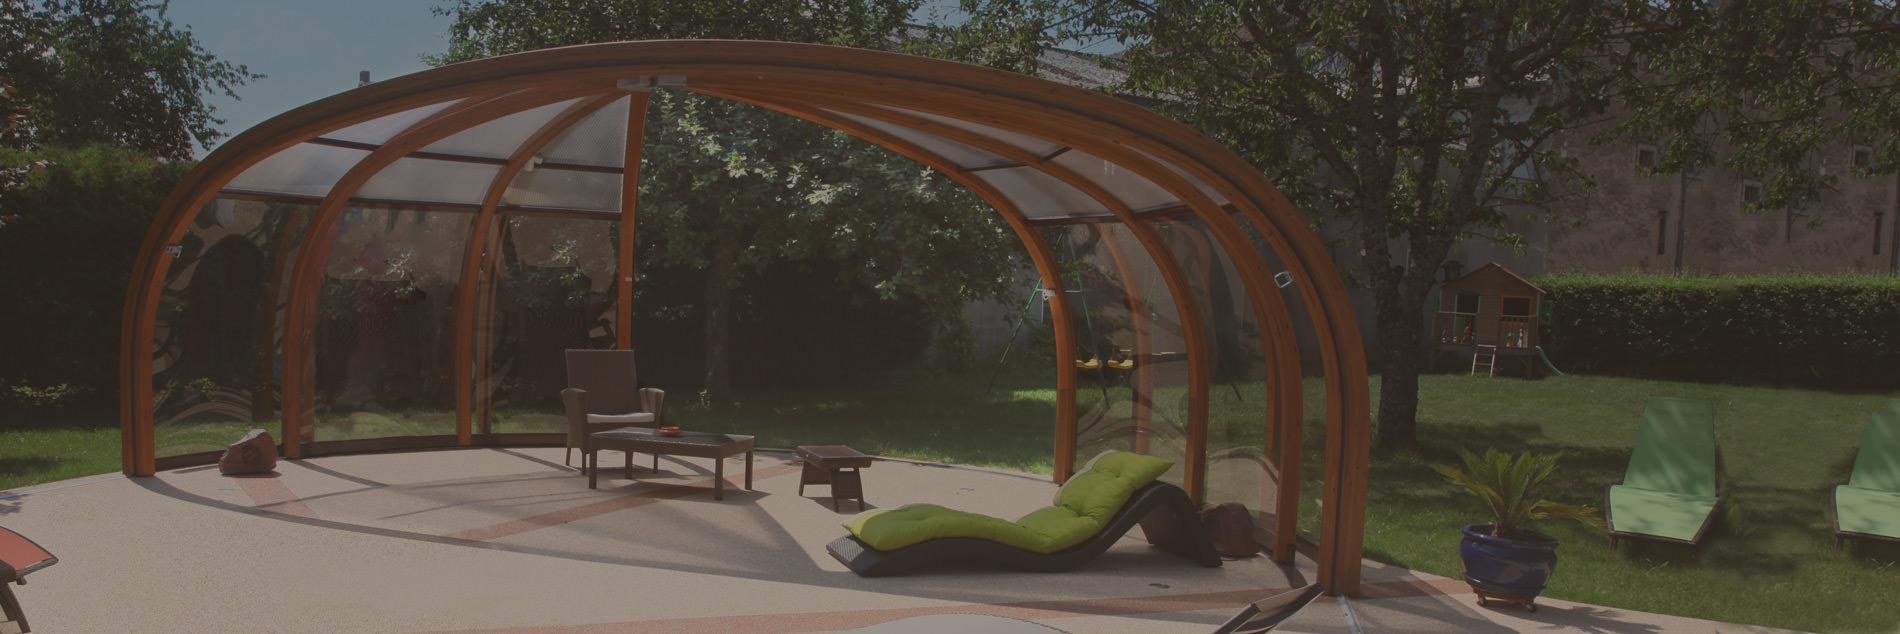 abris terrasse. Black Bedroom Furniture Sets. Home Design Ideas